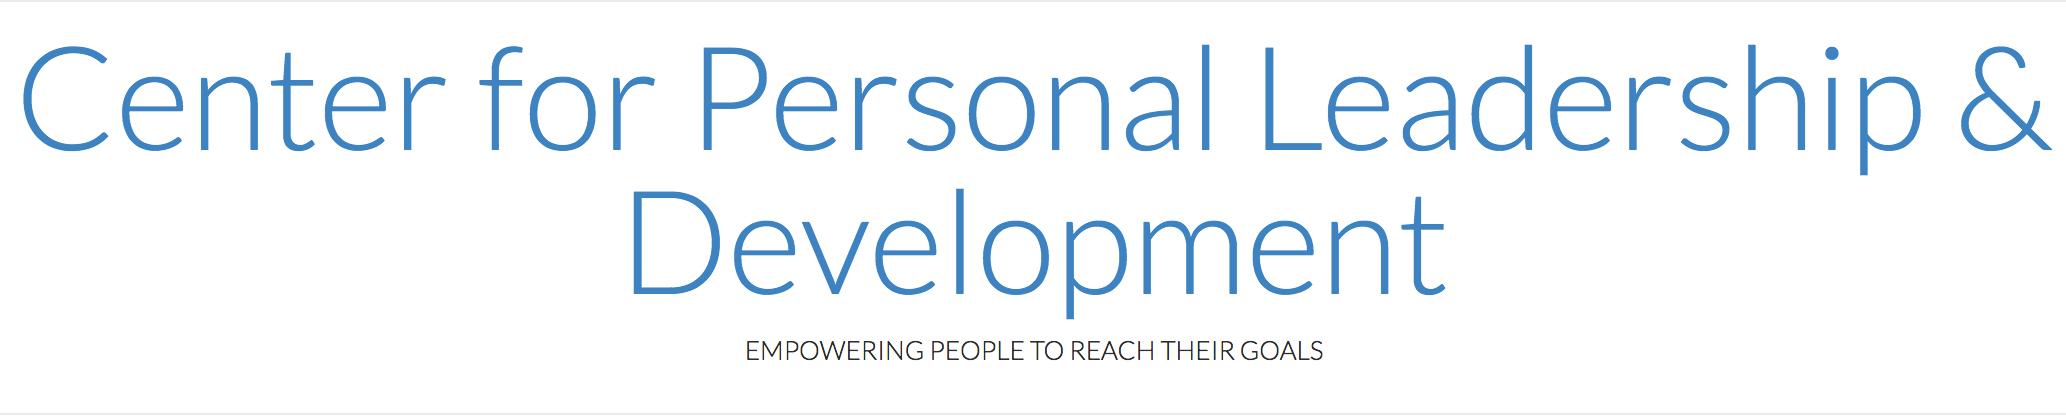 Center for Personal Leadership & Development